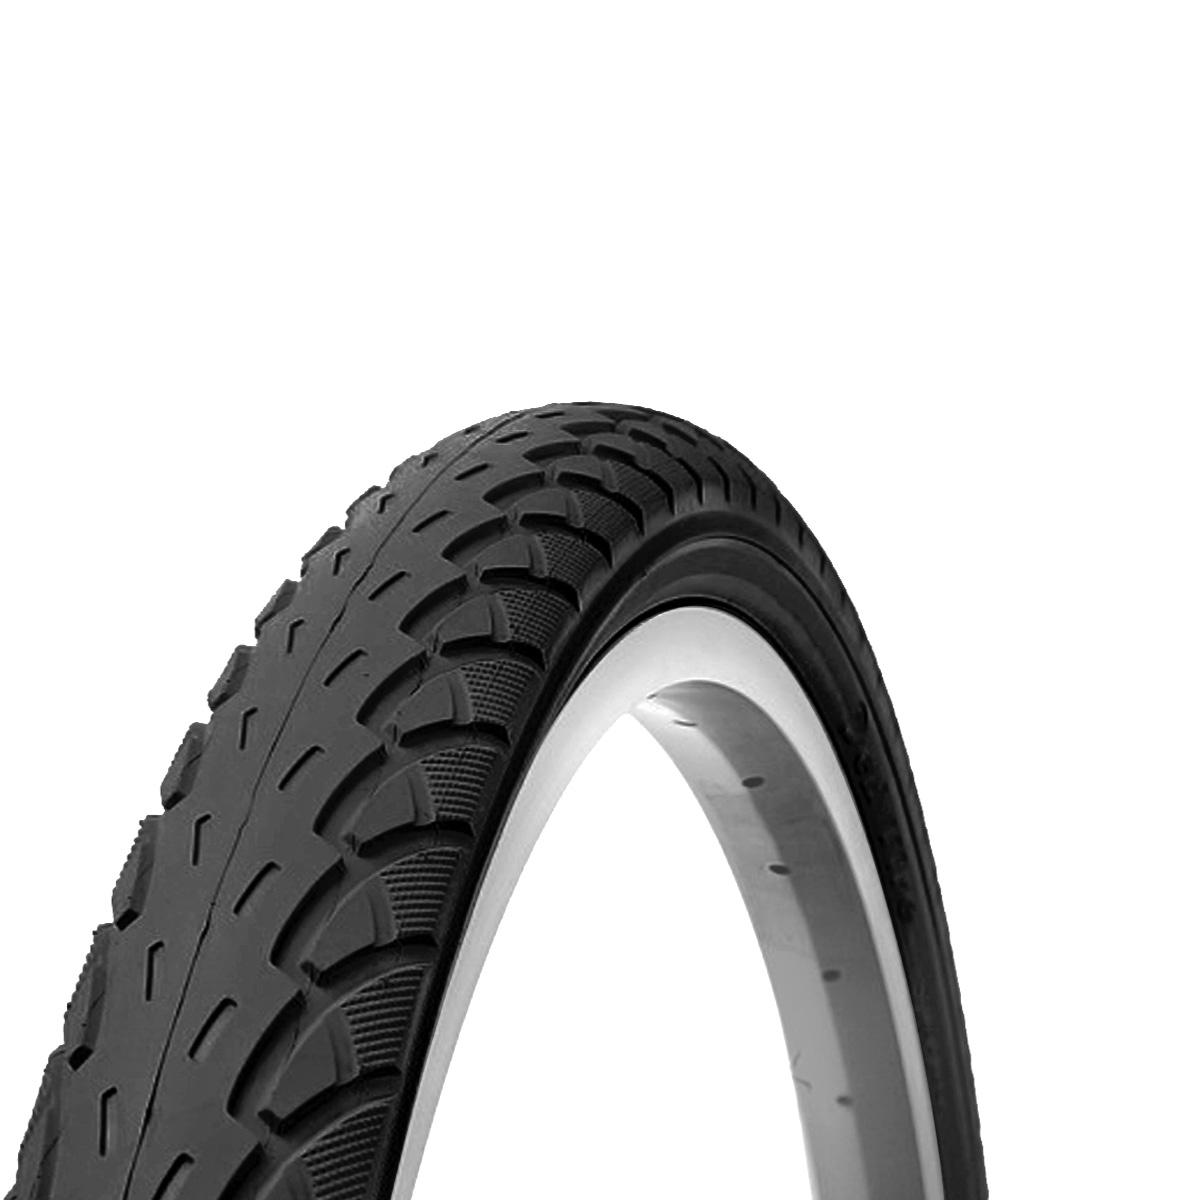 Pneu Deli Tire Slick VTC 26 x 1.75 SA-206 TR Noir